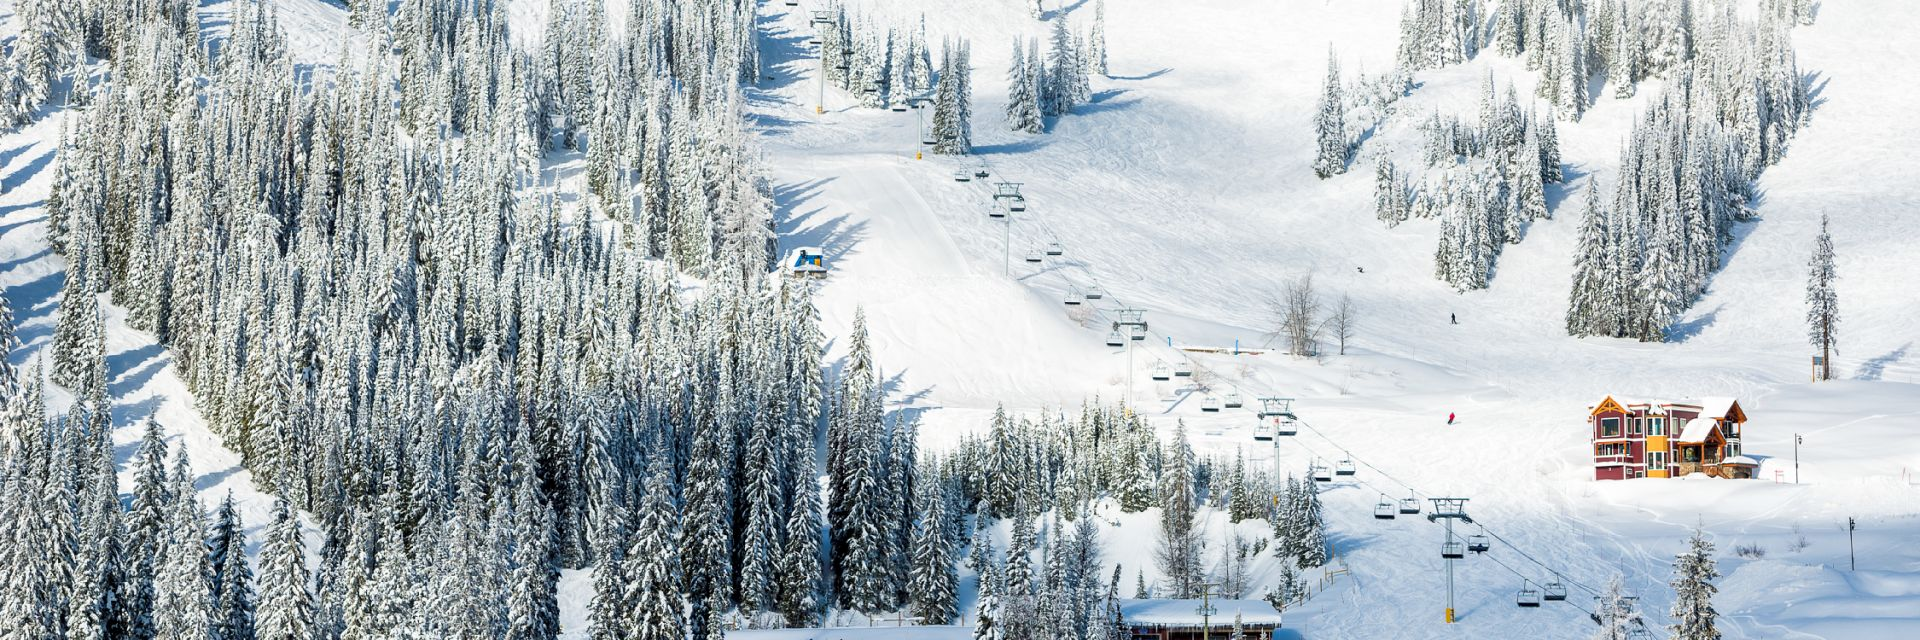 A ski resort in British Columbia